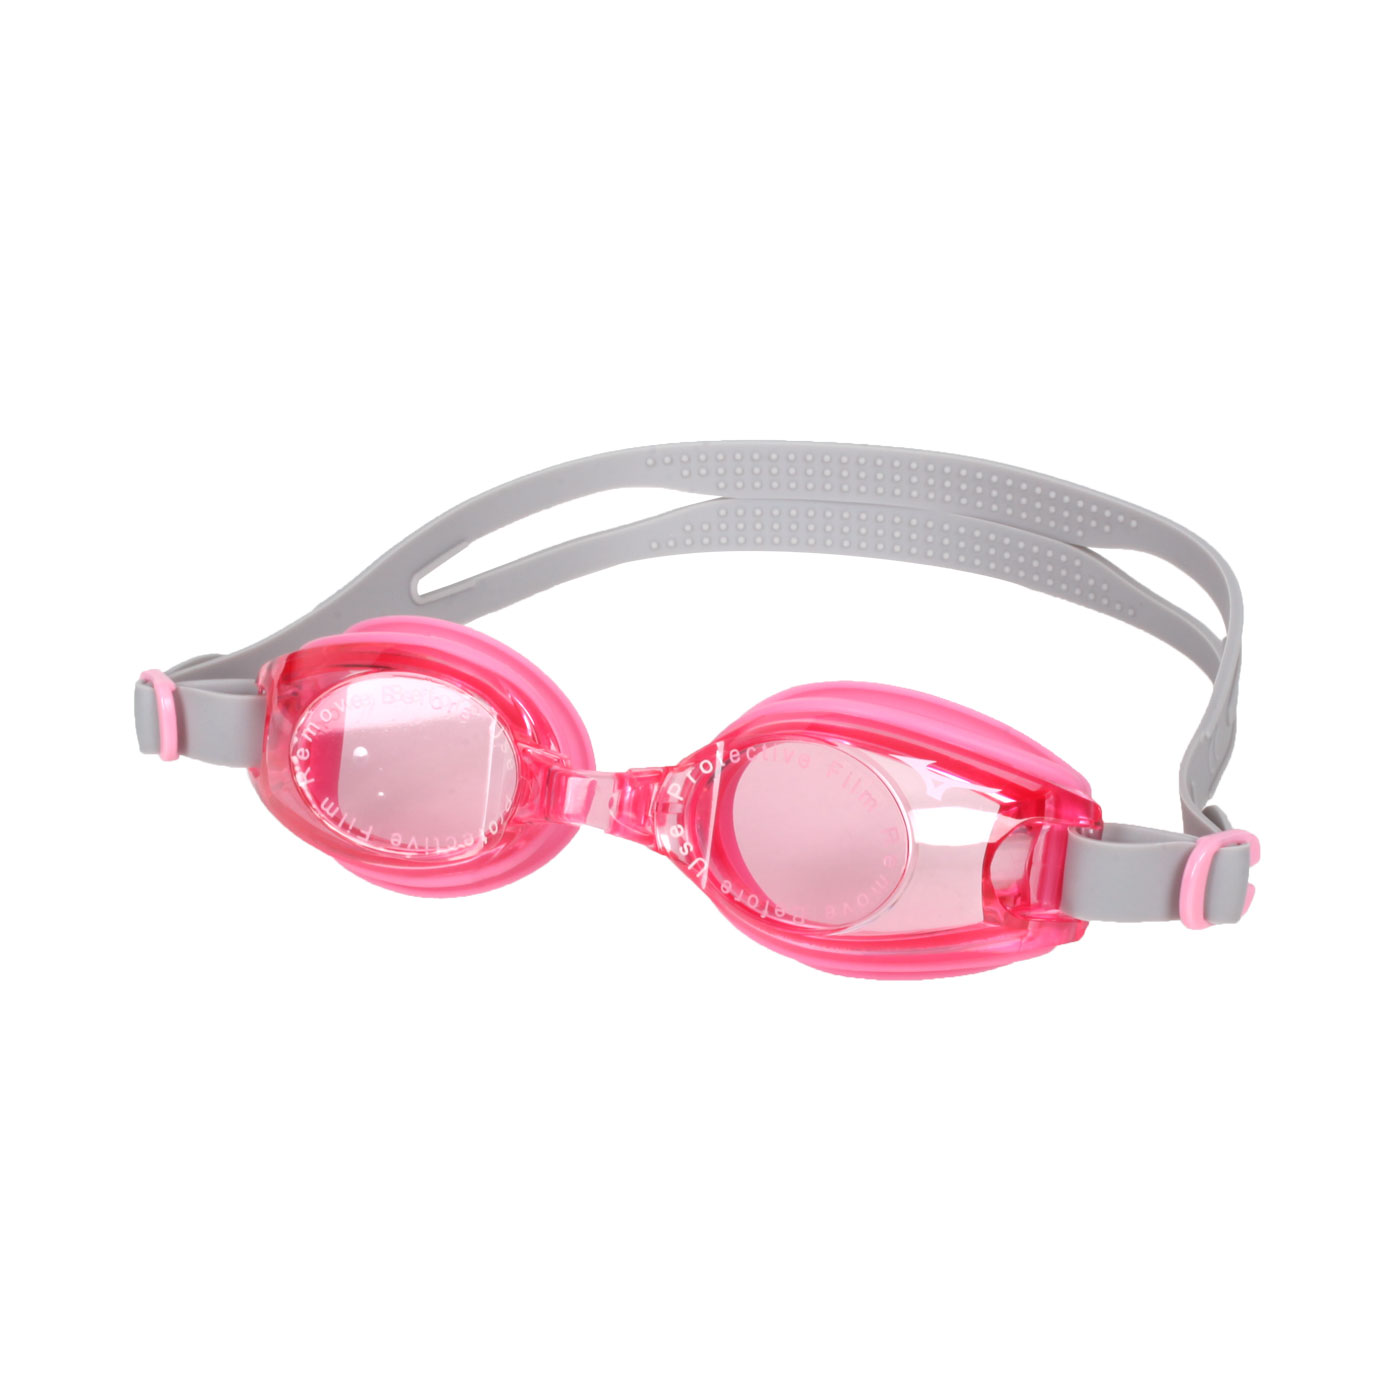 MIZUNO 兒童泳鏡  SWIMN3TF059500-60 - 粉紅灰